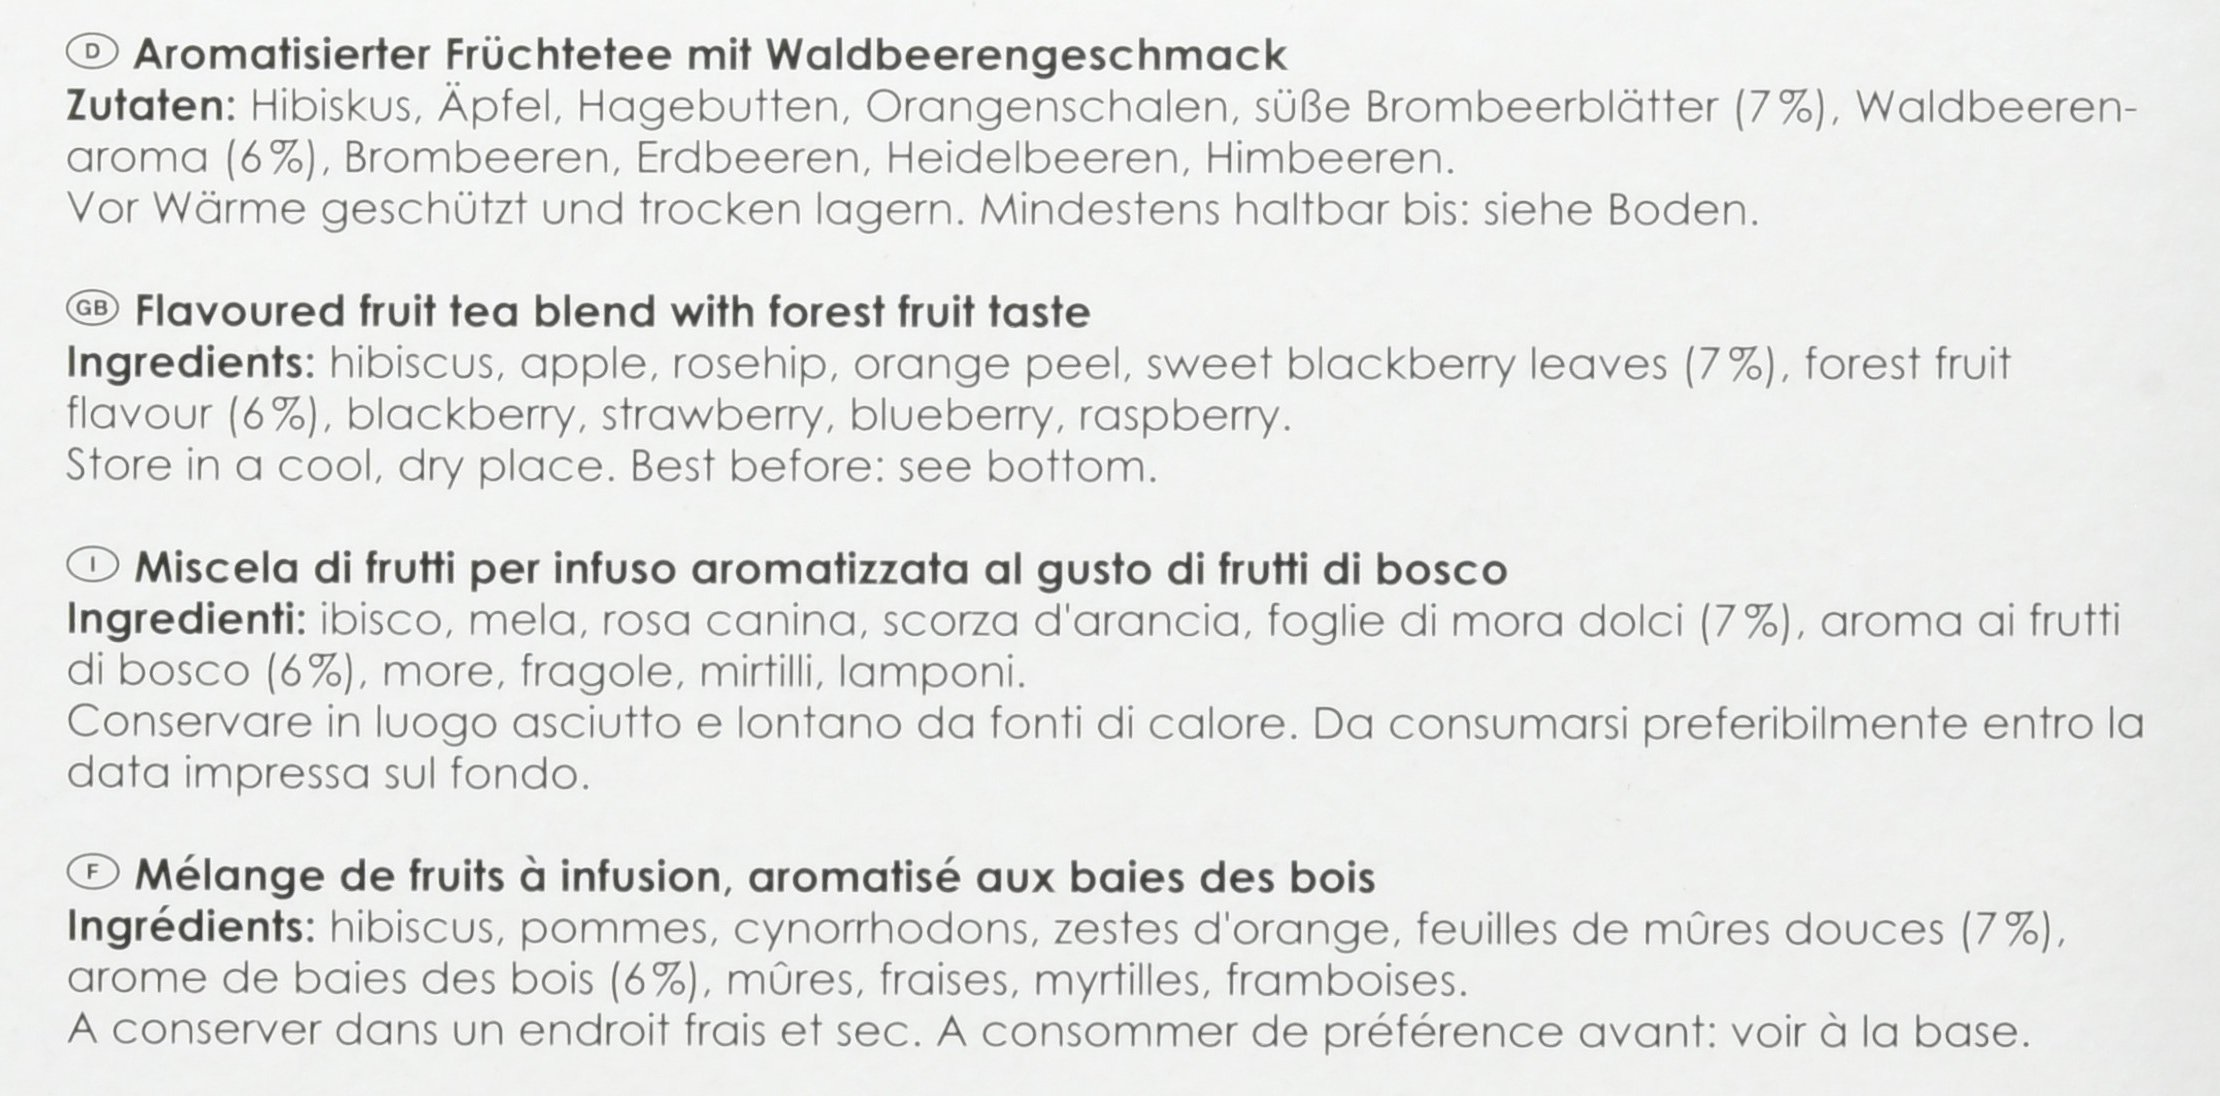 Teekanne-easy-Tea-Waldbeere-10-Stck-Teekapseln-fr-Nespresso-Kaffeemaschinen-6x-10er-Pack-6-x-35-g